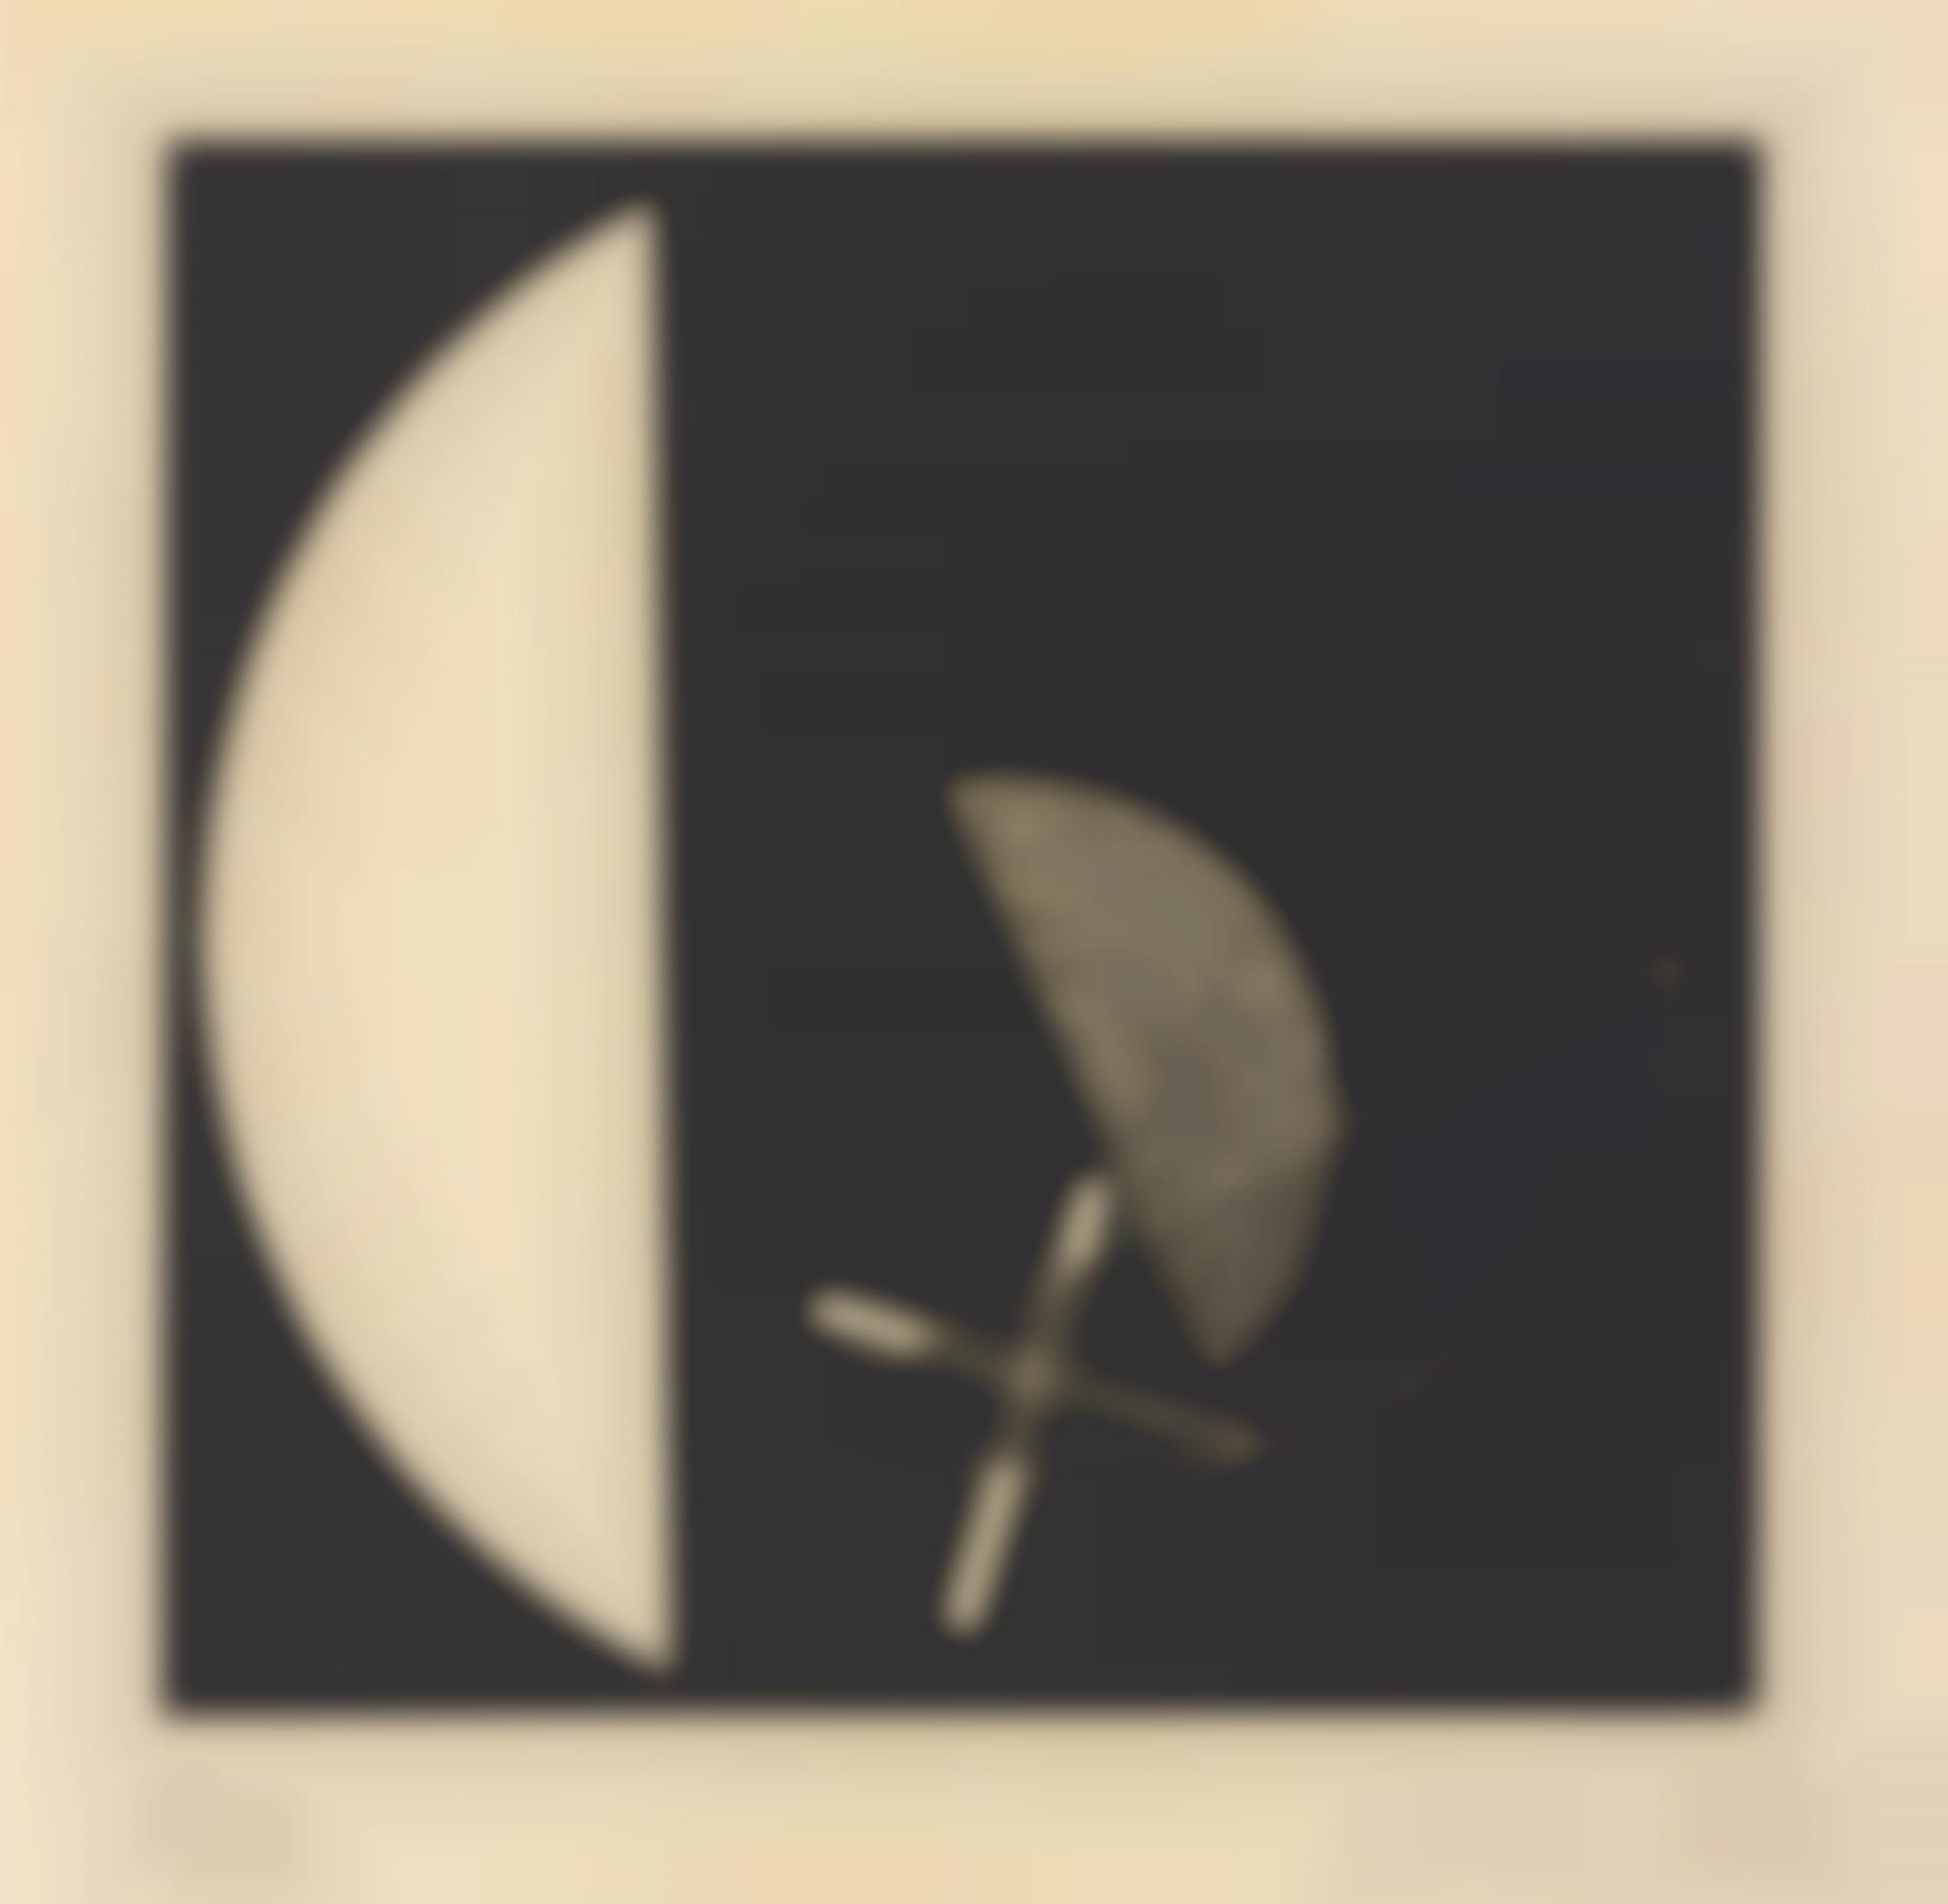 Laszlo Moholy-Nagy-Segments Of A Circle With Cross (See Passuth 132)-1923